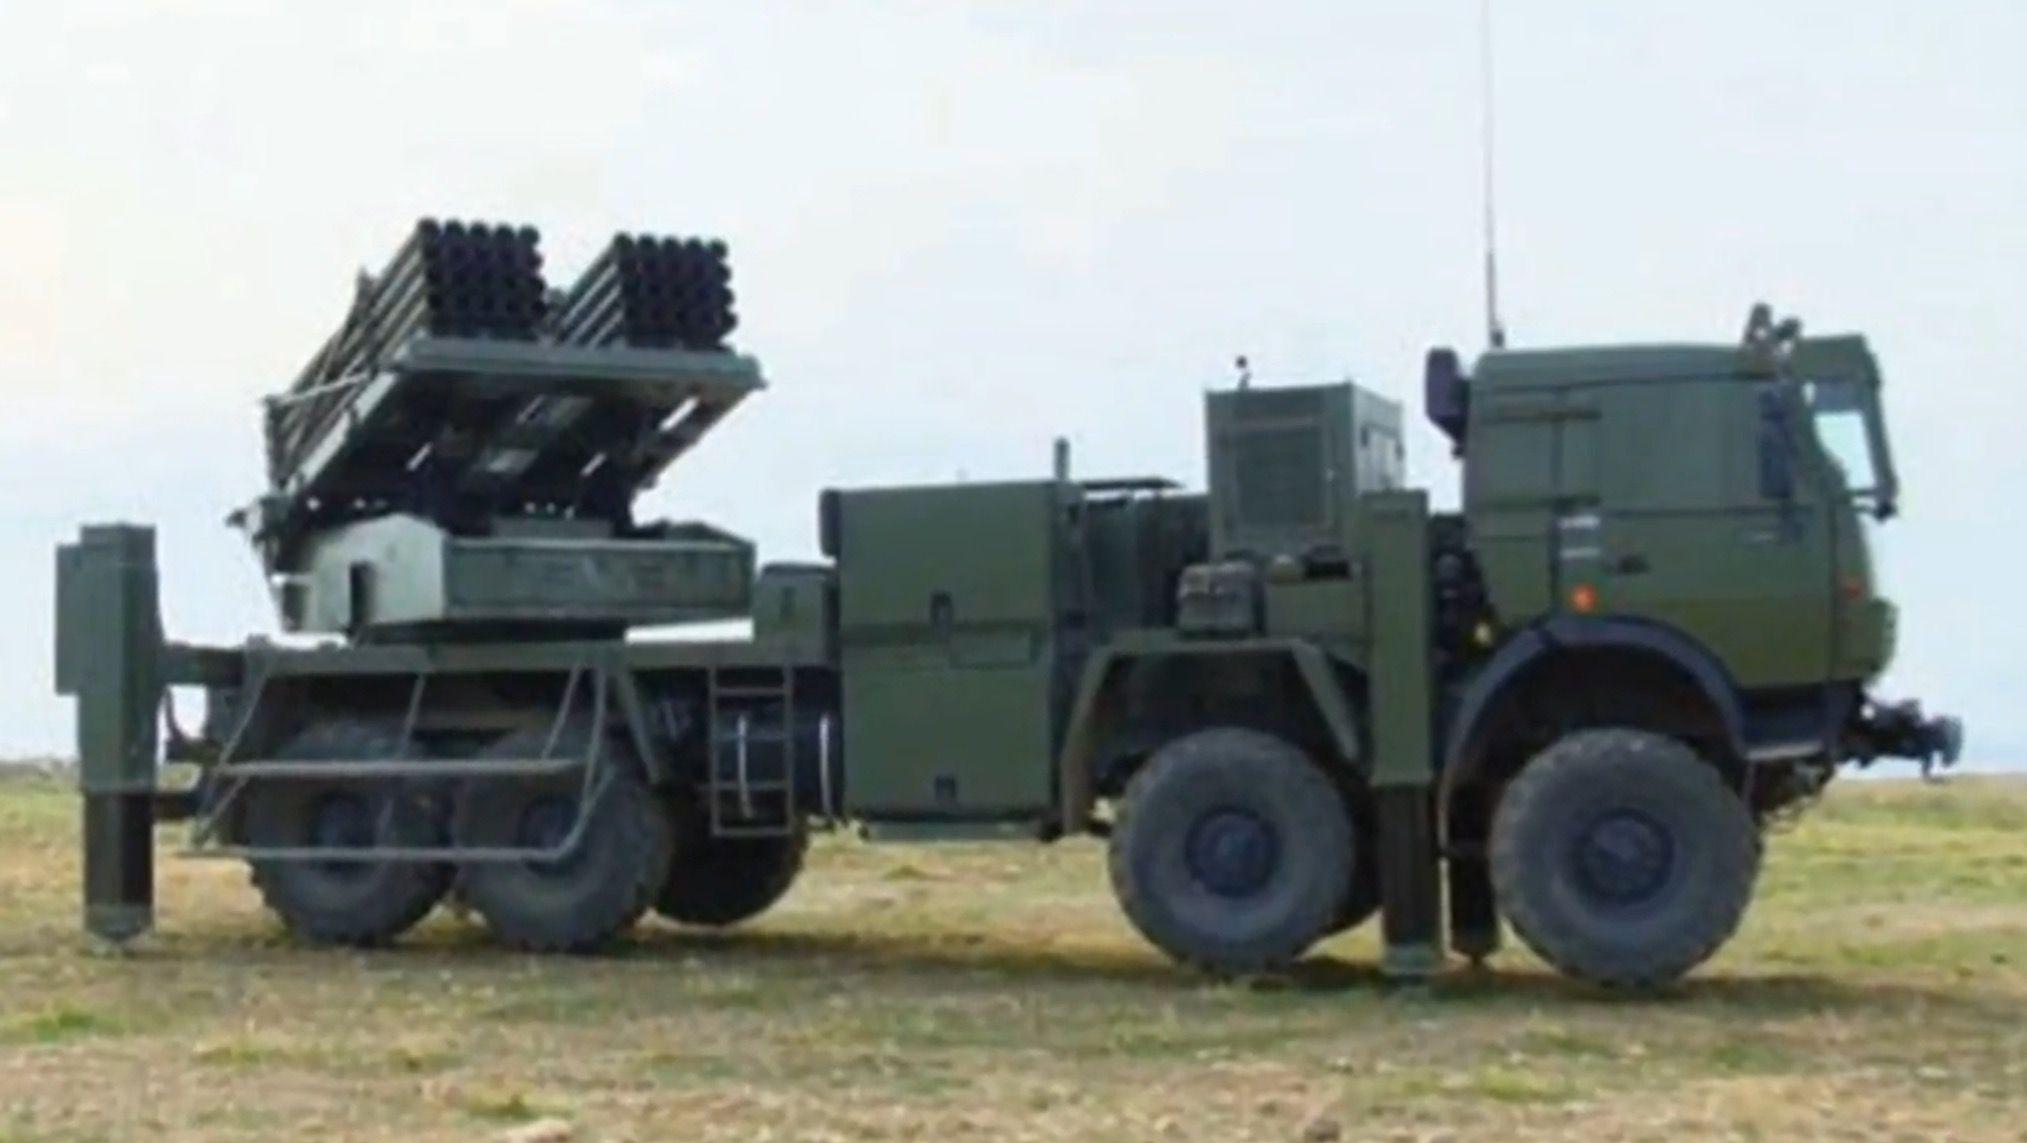 Grcka kupila Srpske rakete. D4fa895ae99bfe0117daecc27afdbd8c